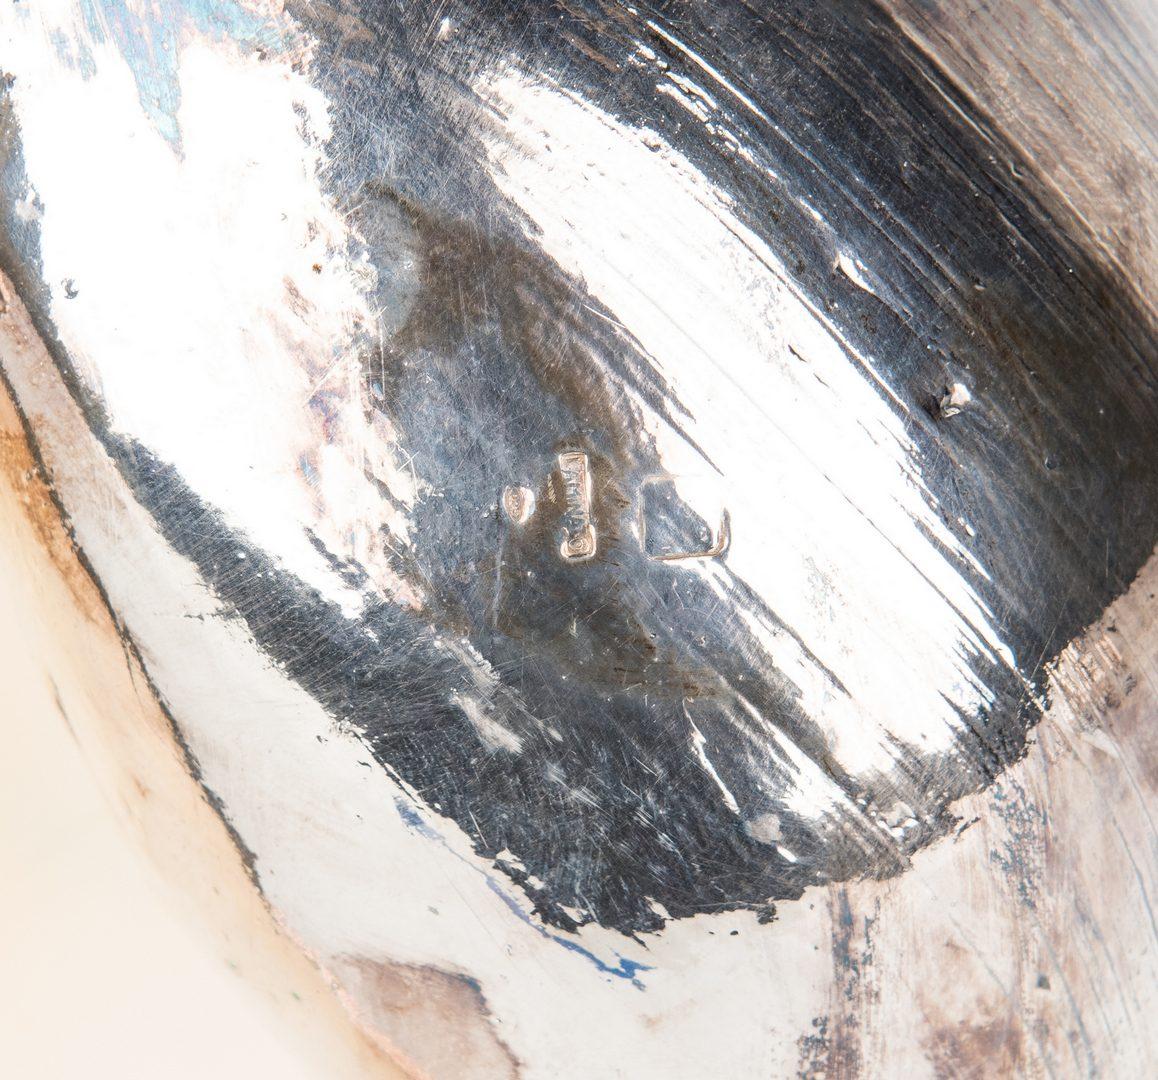 Lot 421: 7 Silver Clad Seashells, incl. Ruzzetti & Gow